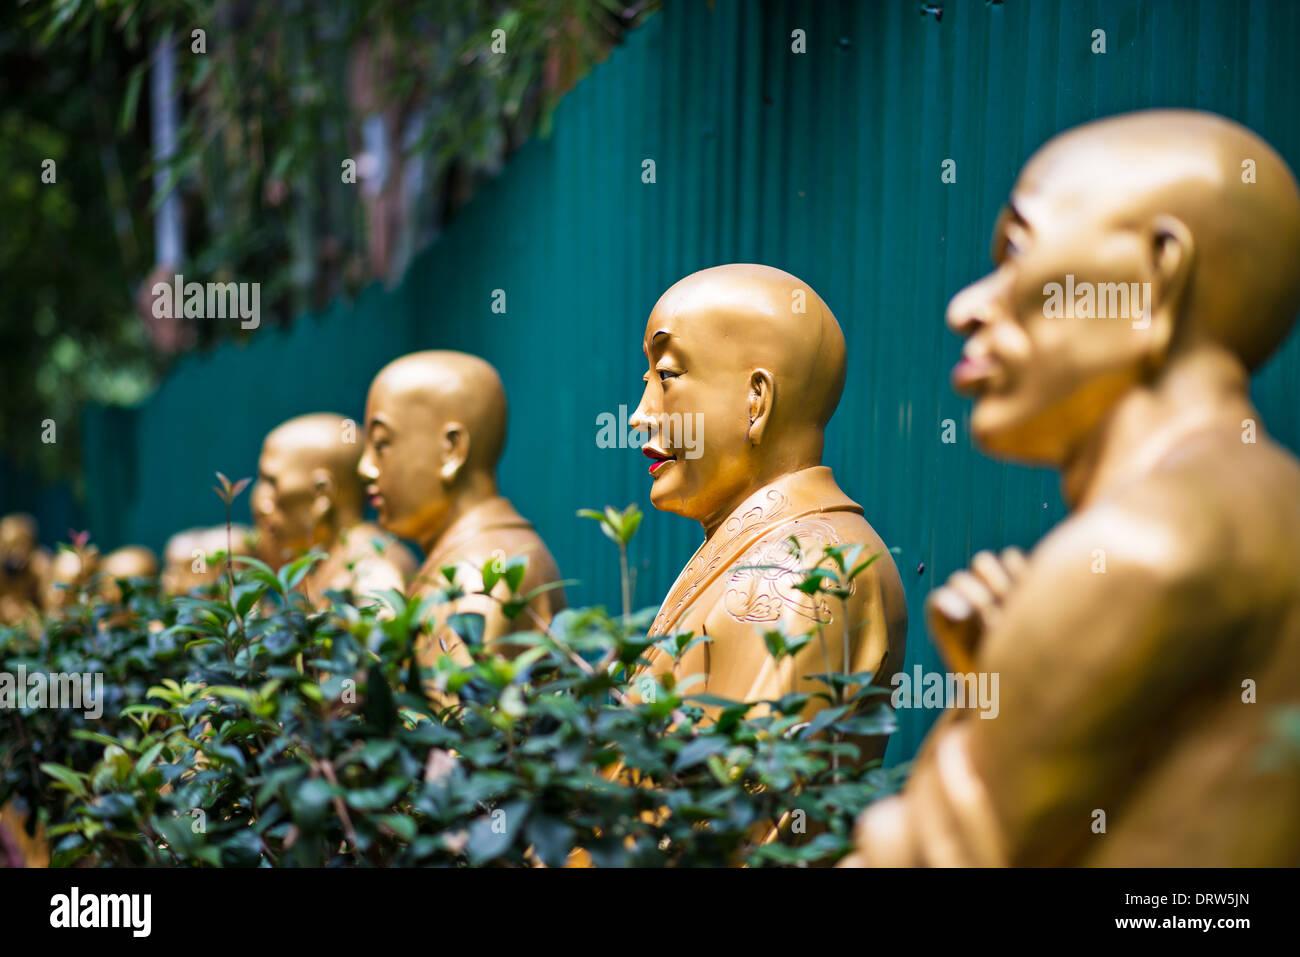 Buddha statues at Ten Thousand Buddhas Monastery in Hong Kong, China. - Stock Image